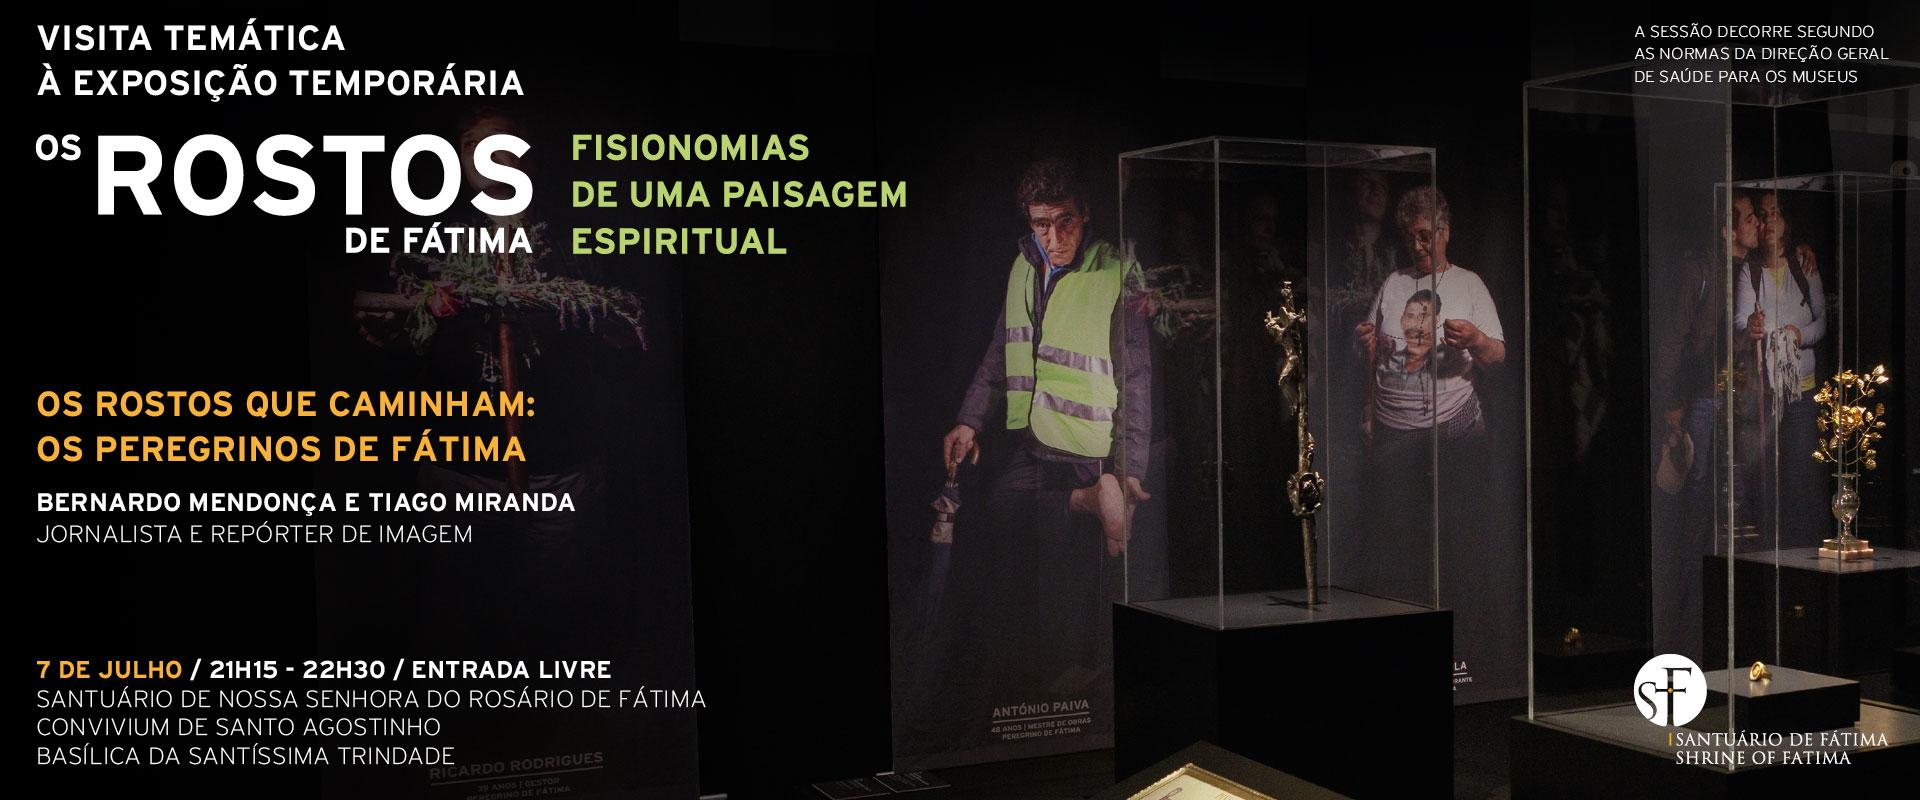 2021-06-30_Visita_Tematica_Expo_2.jpg